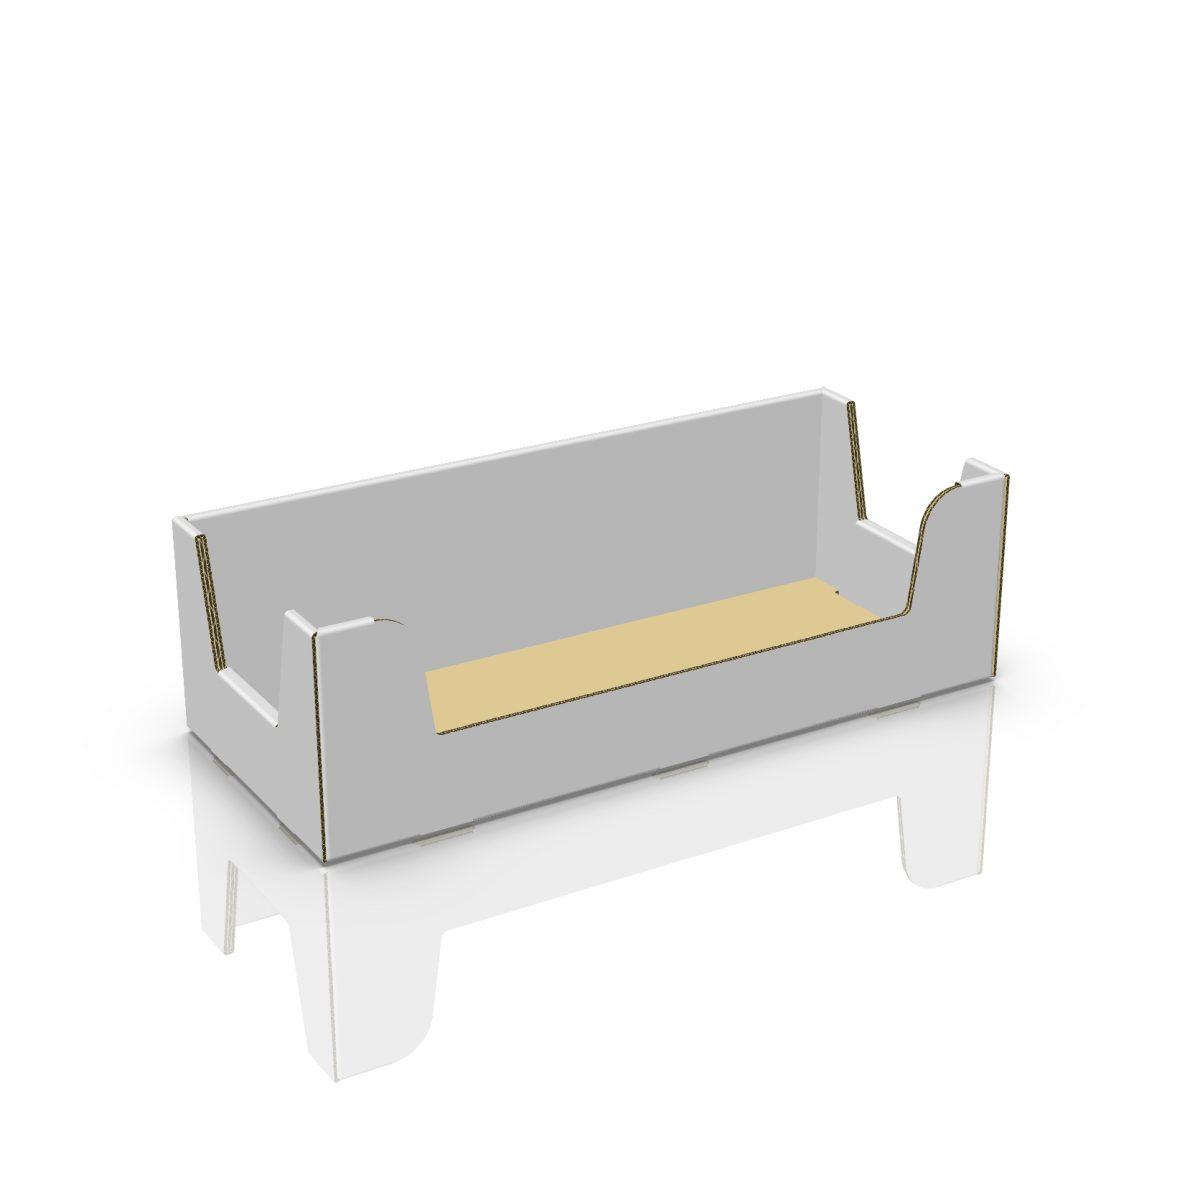 Cardboard counter display, rectangle box - 3d